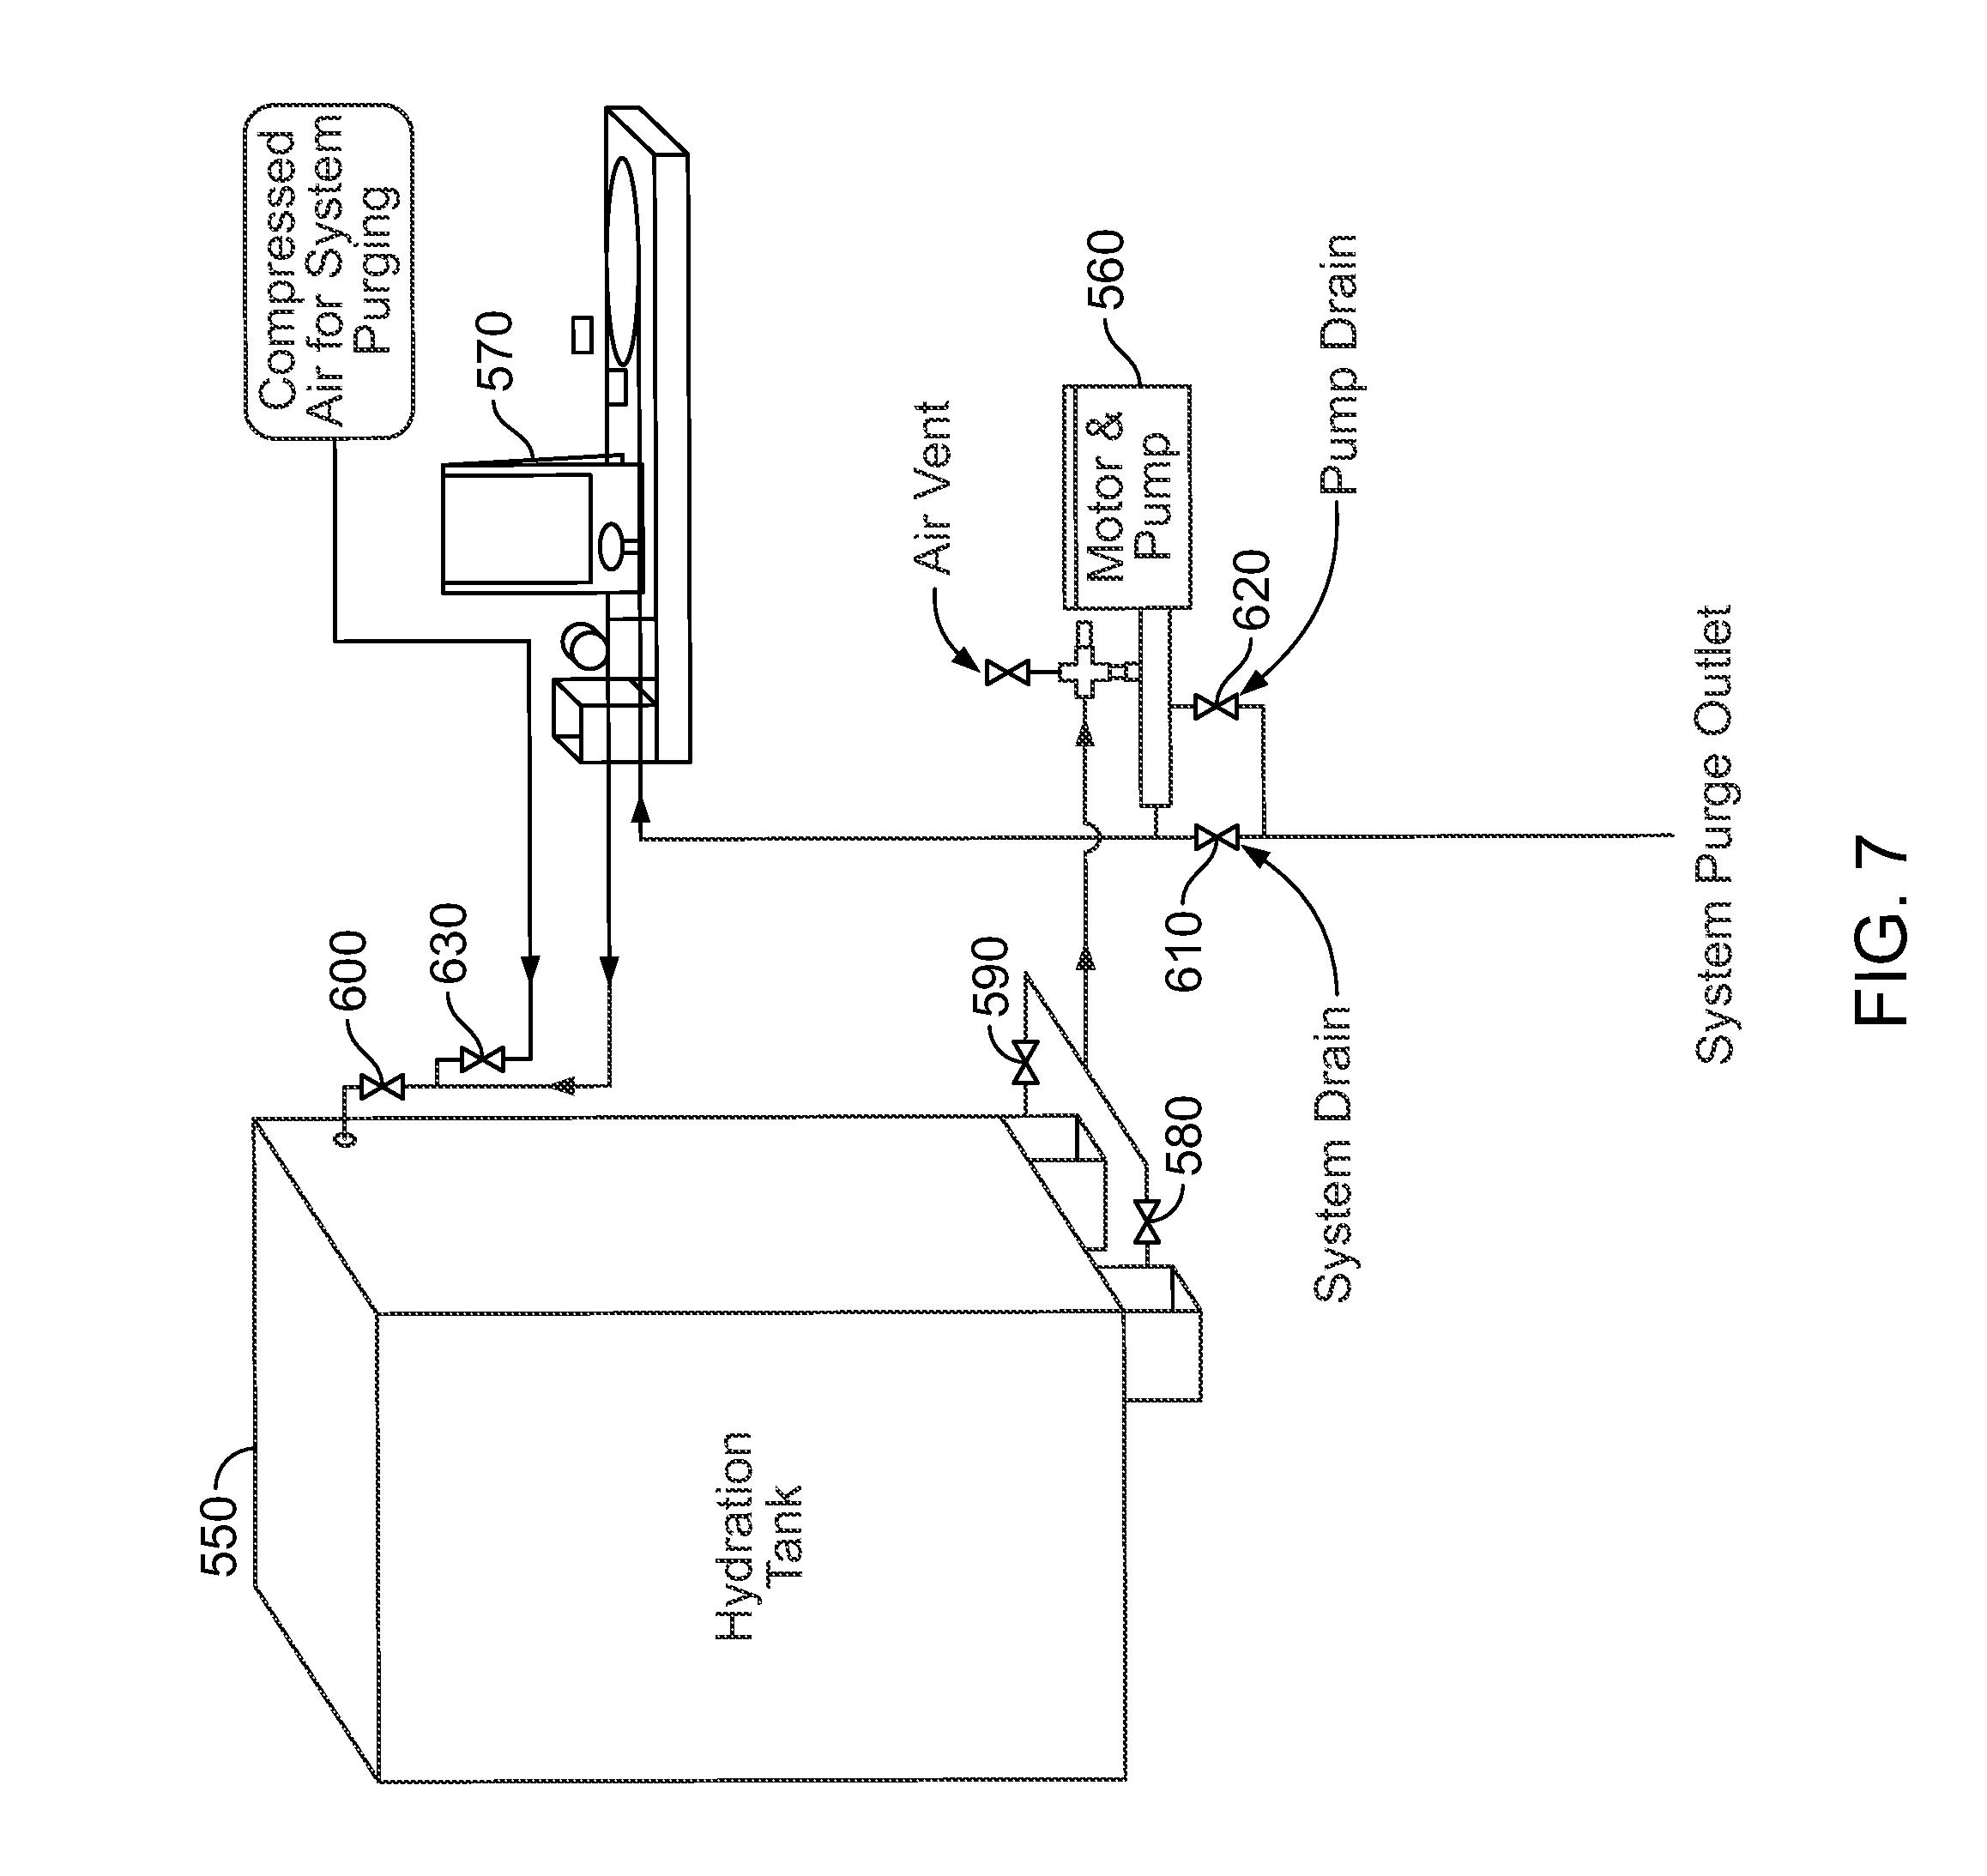 rosemount pressure transmitter wiring diagram 2003 harley sportster diagrams 25 images